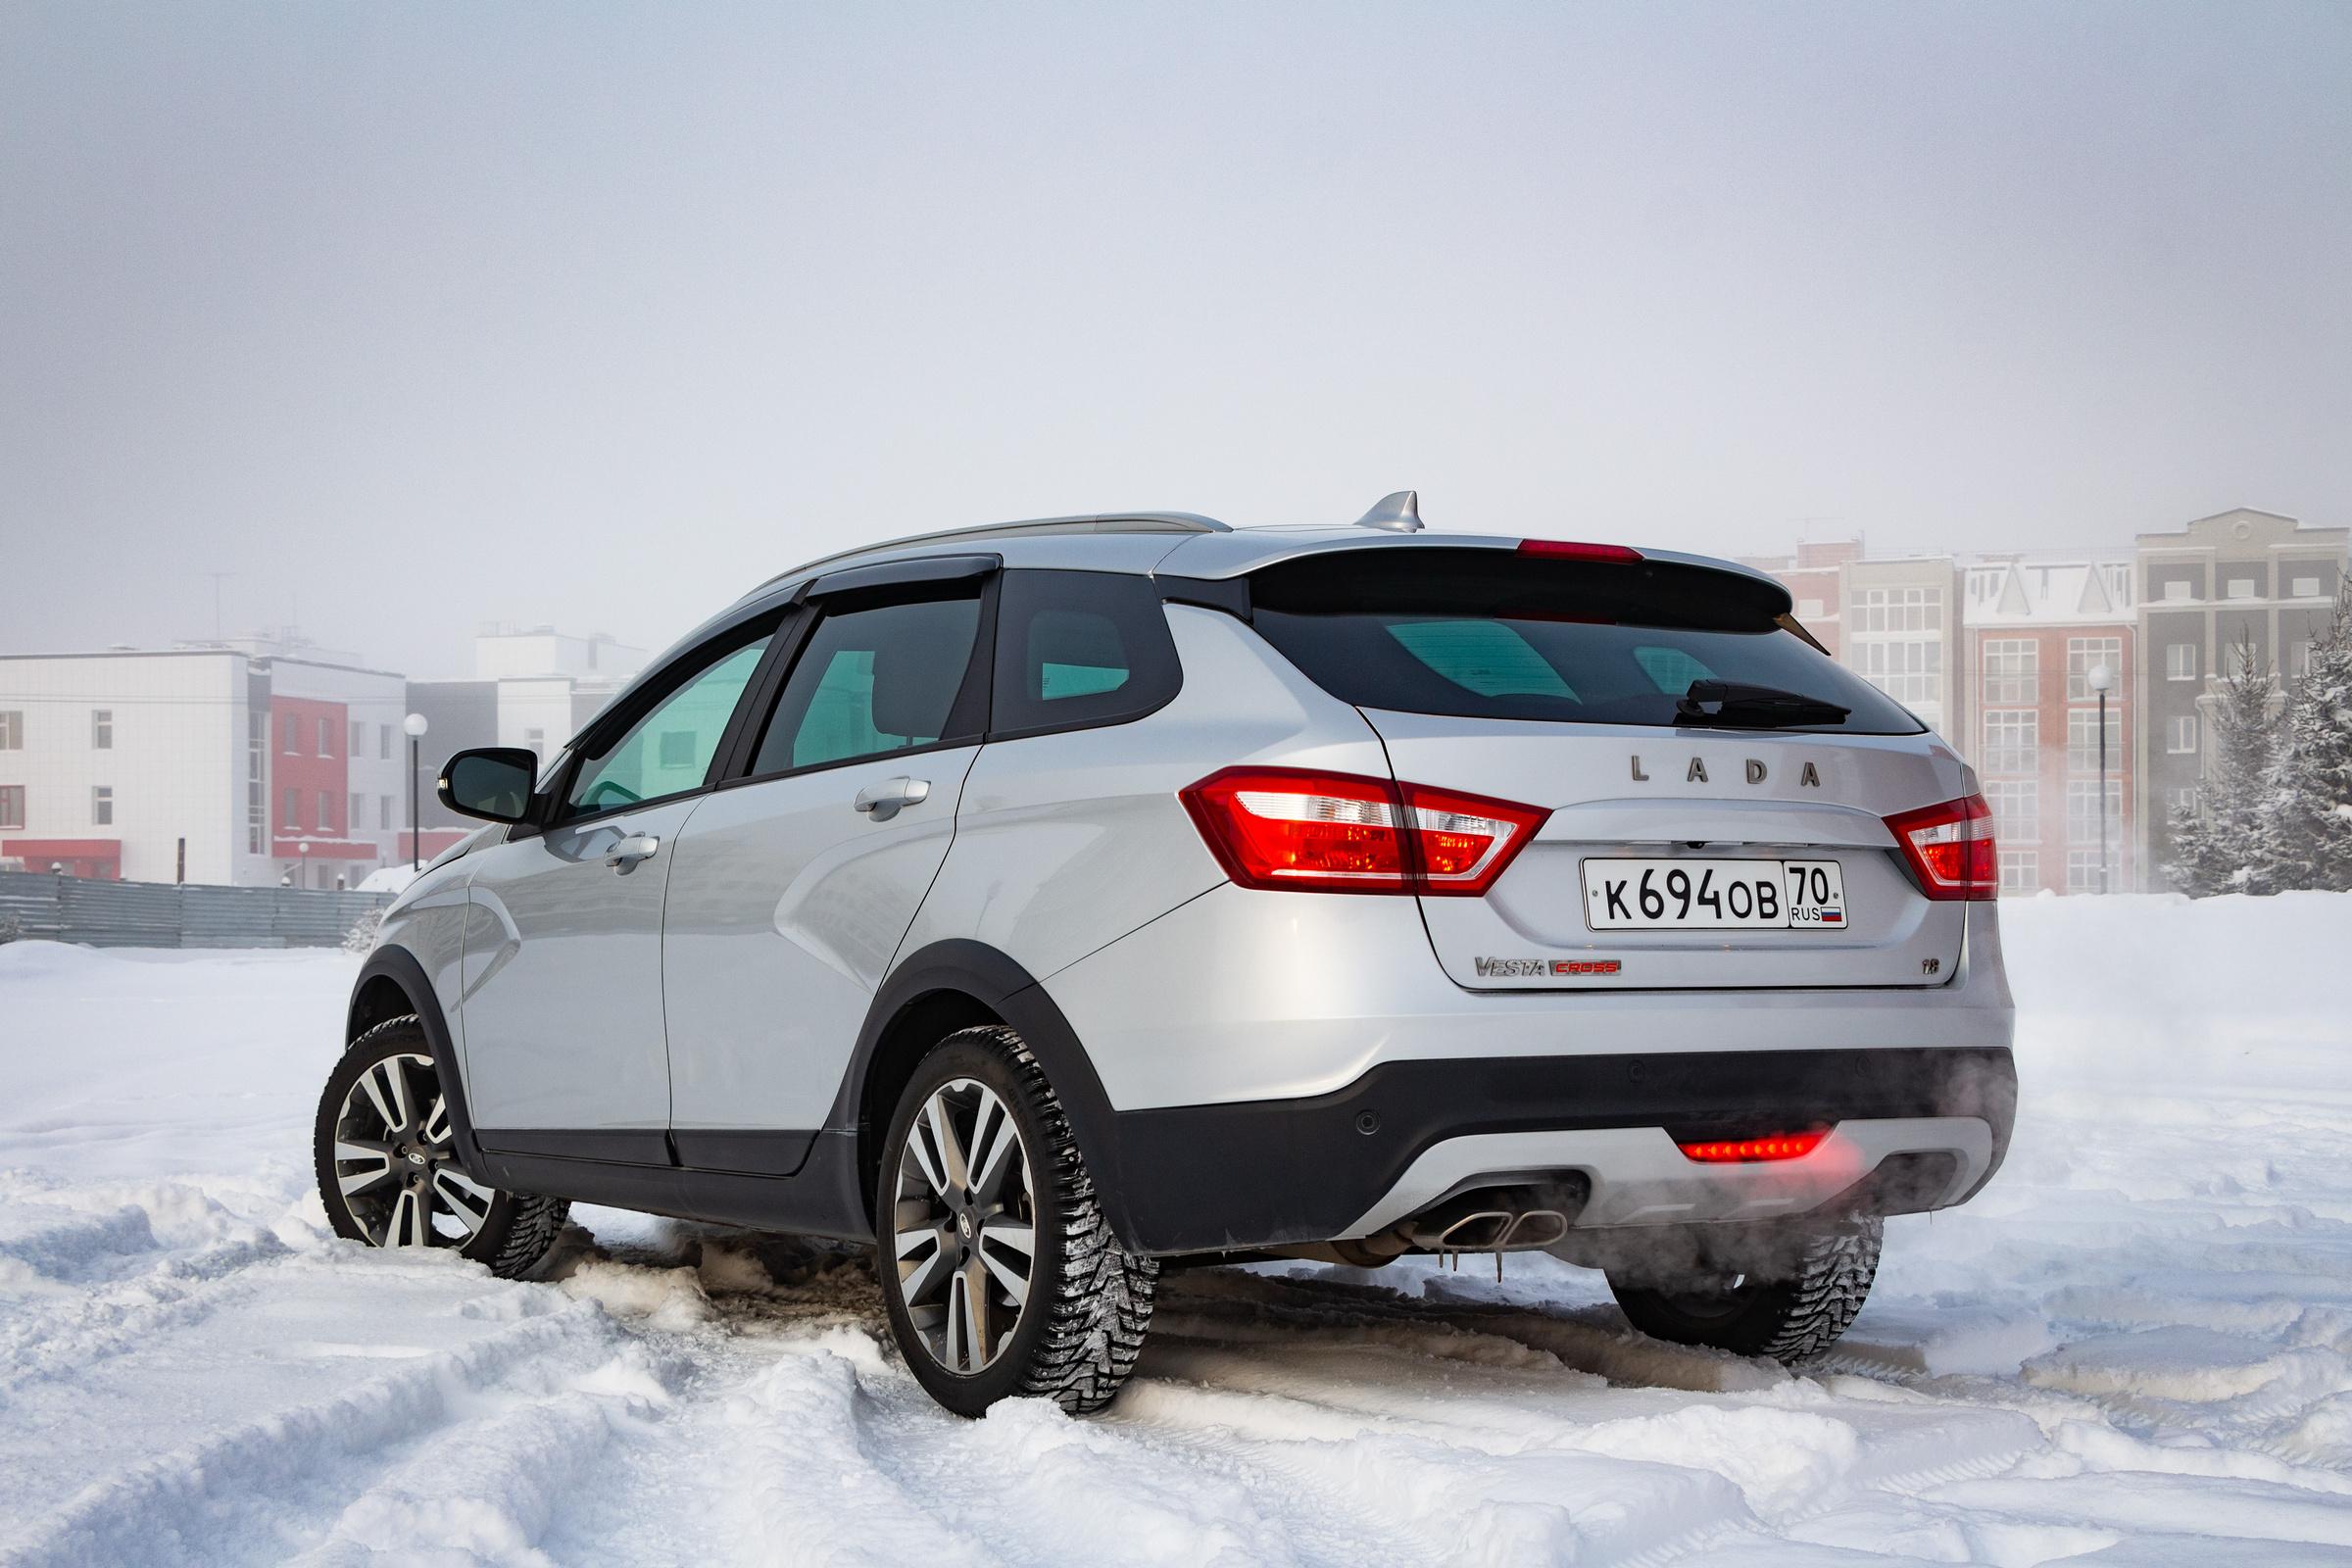 Silver Lada Vesta in snow